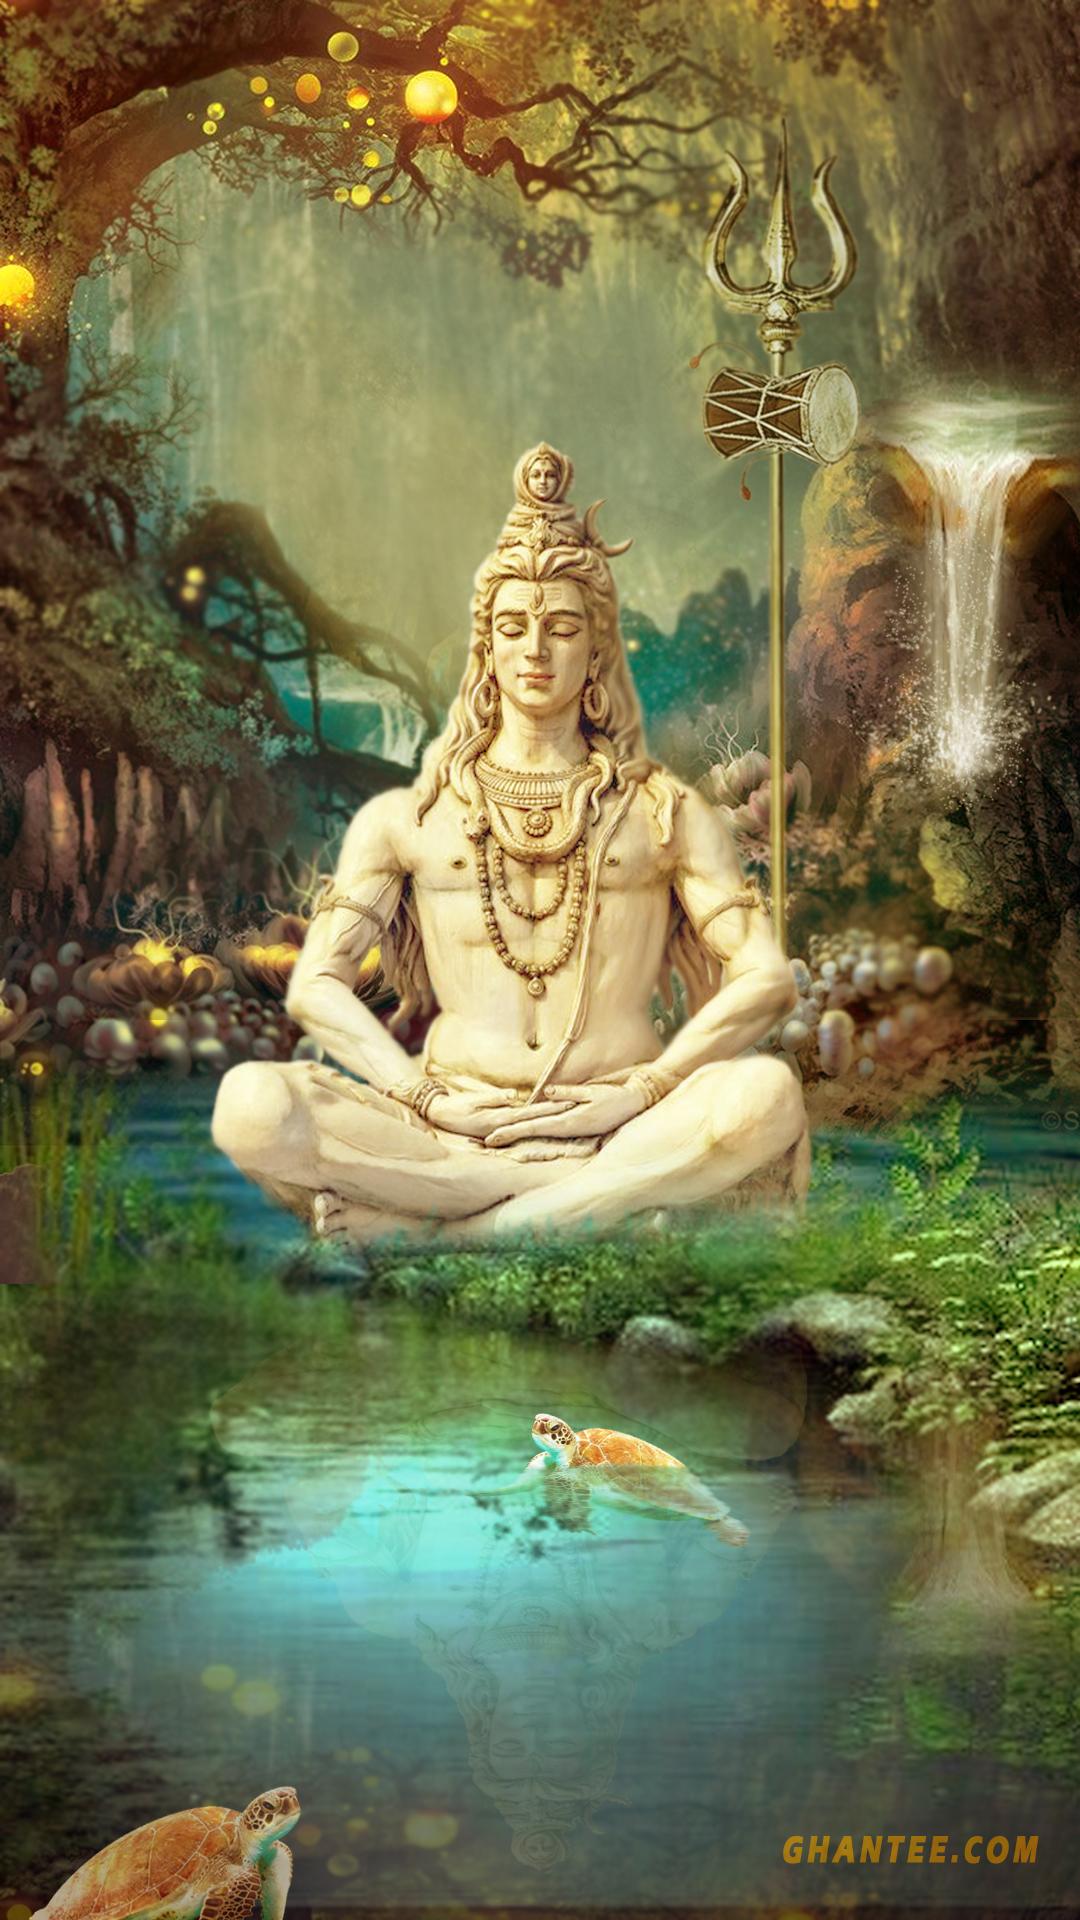 mahakal image for mobile devices